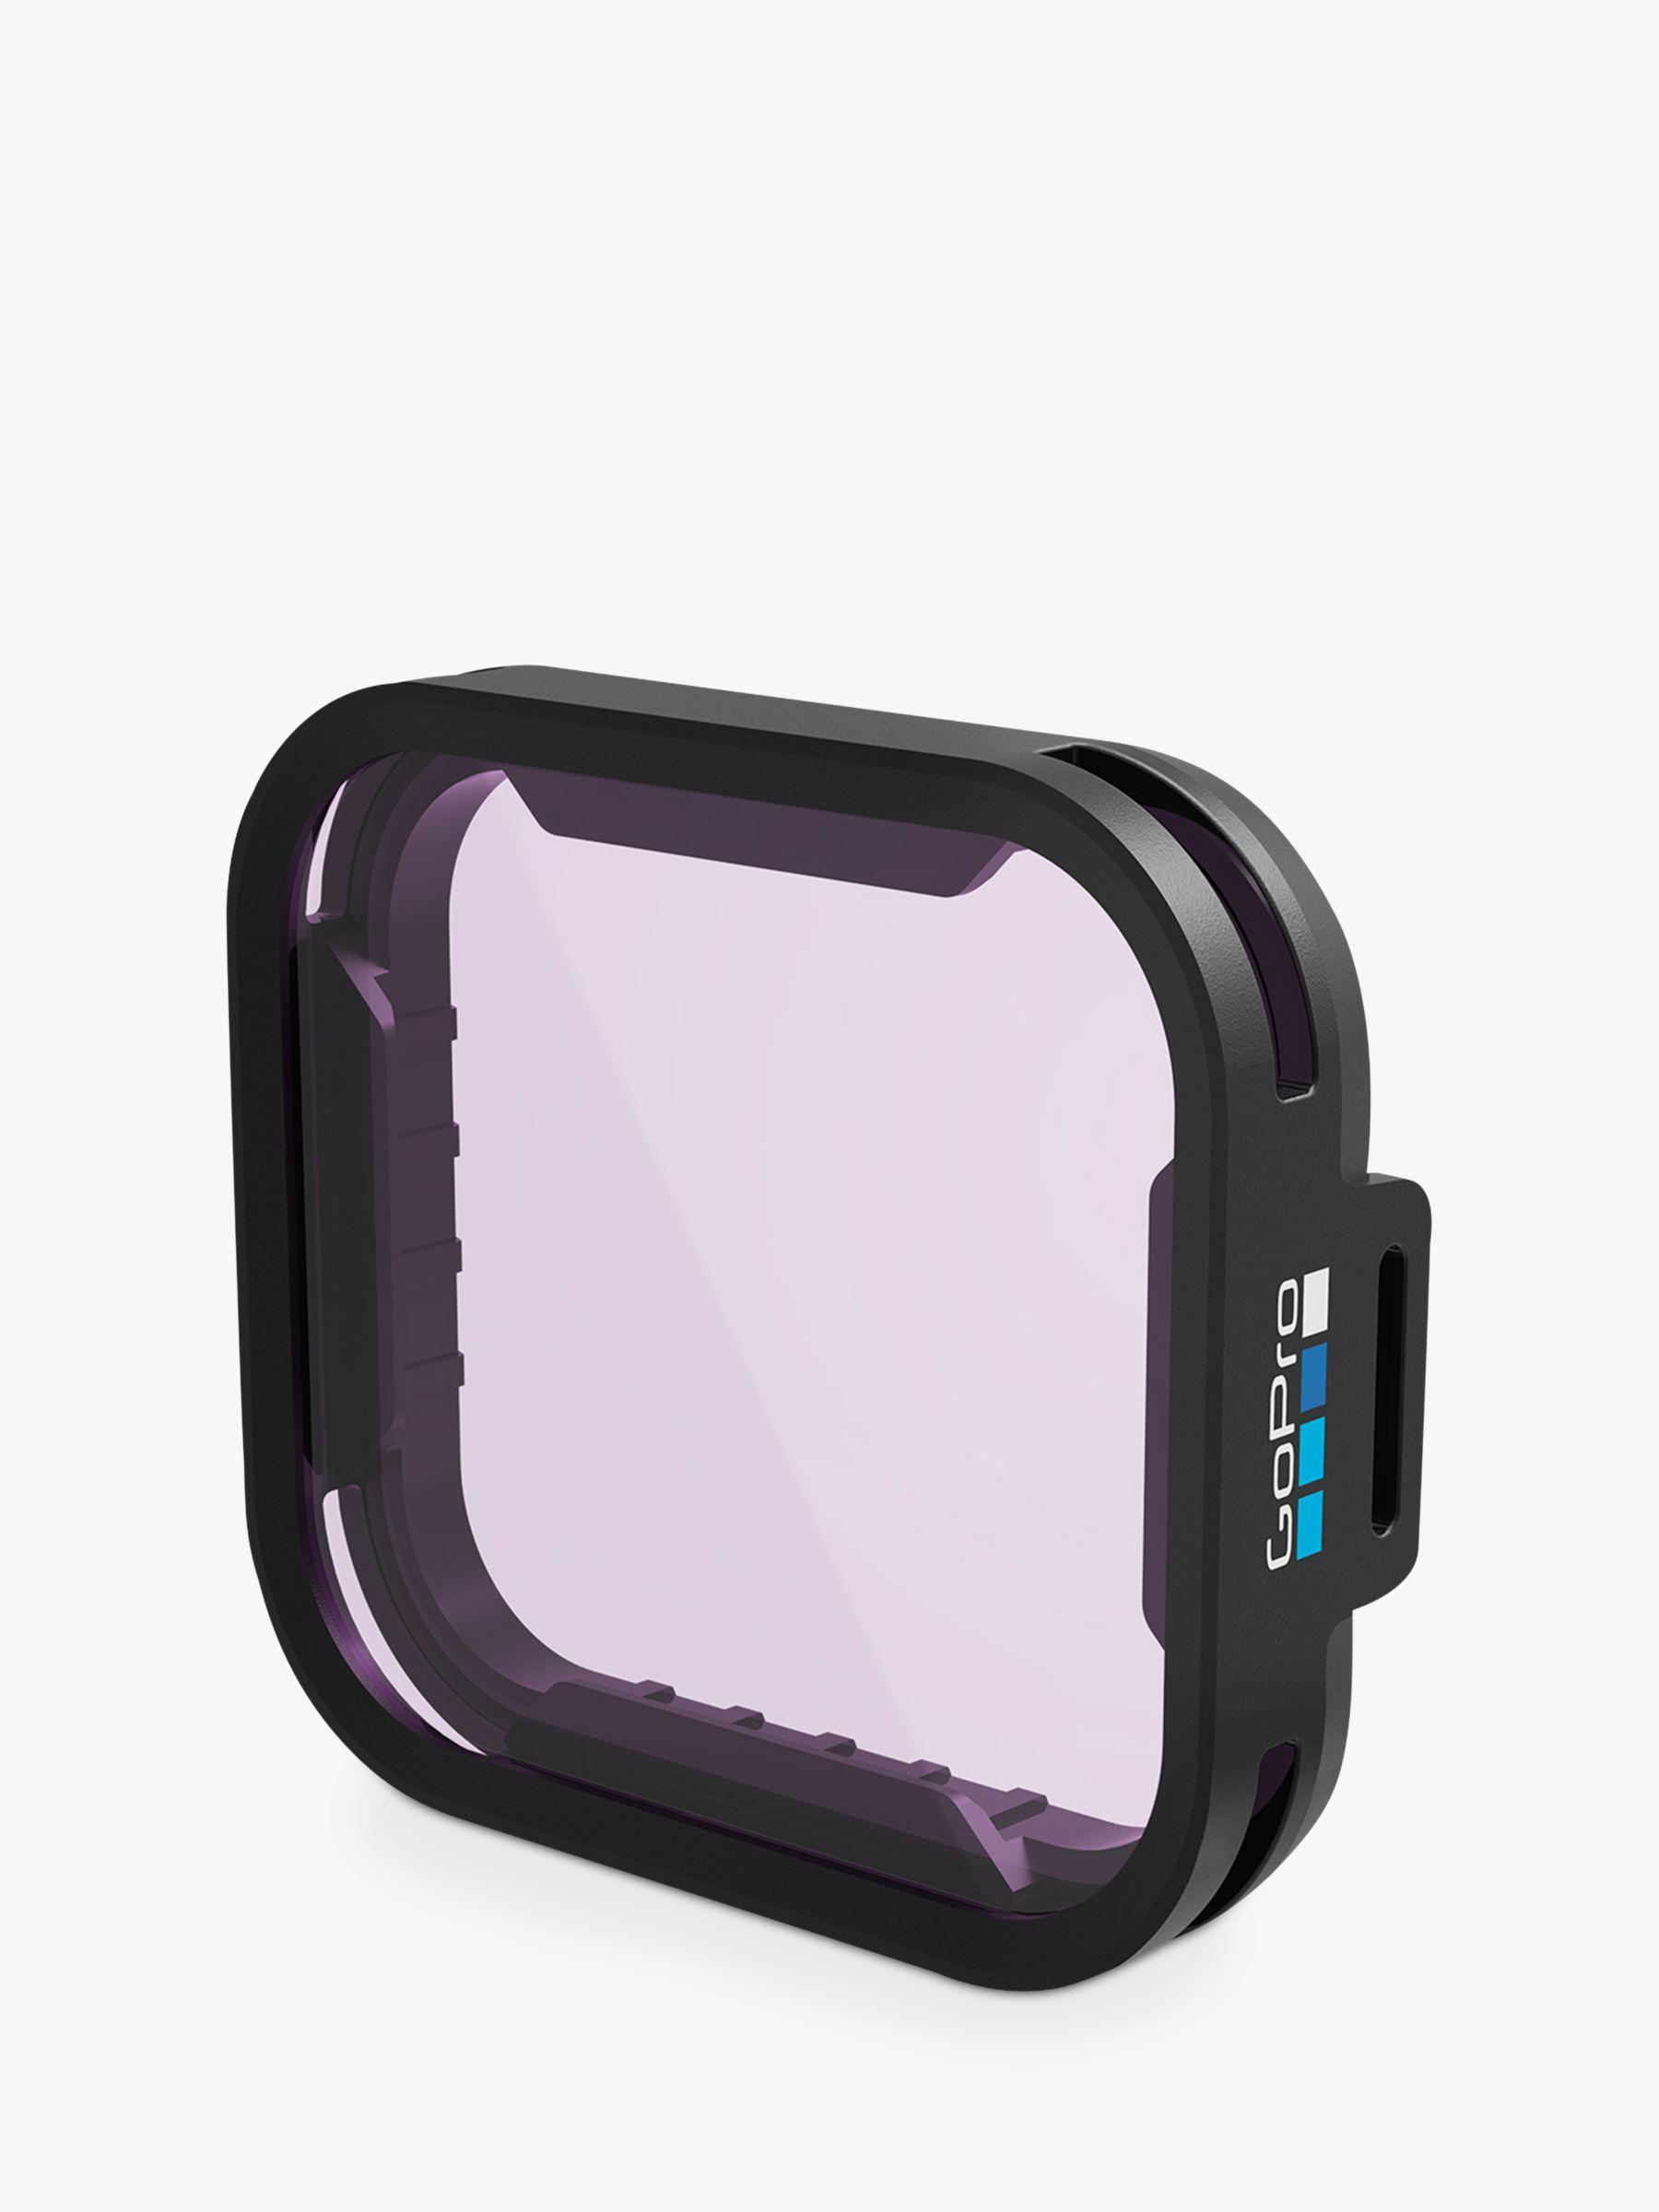 Gopro GoPro Green Water Dive Filter for HERO5 Black